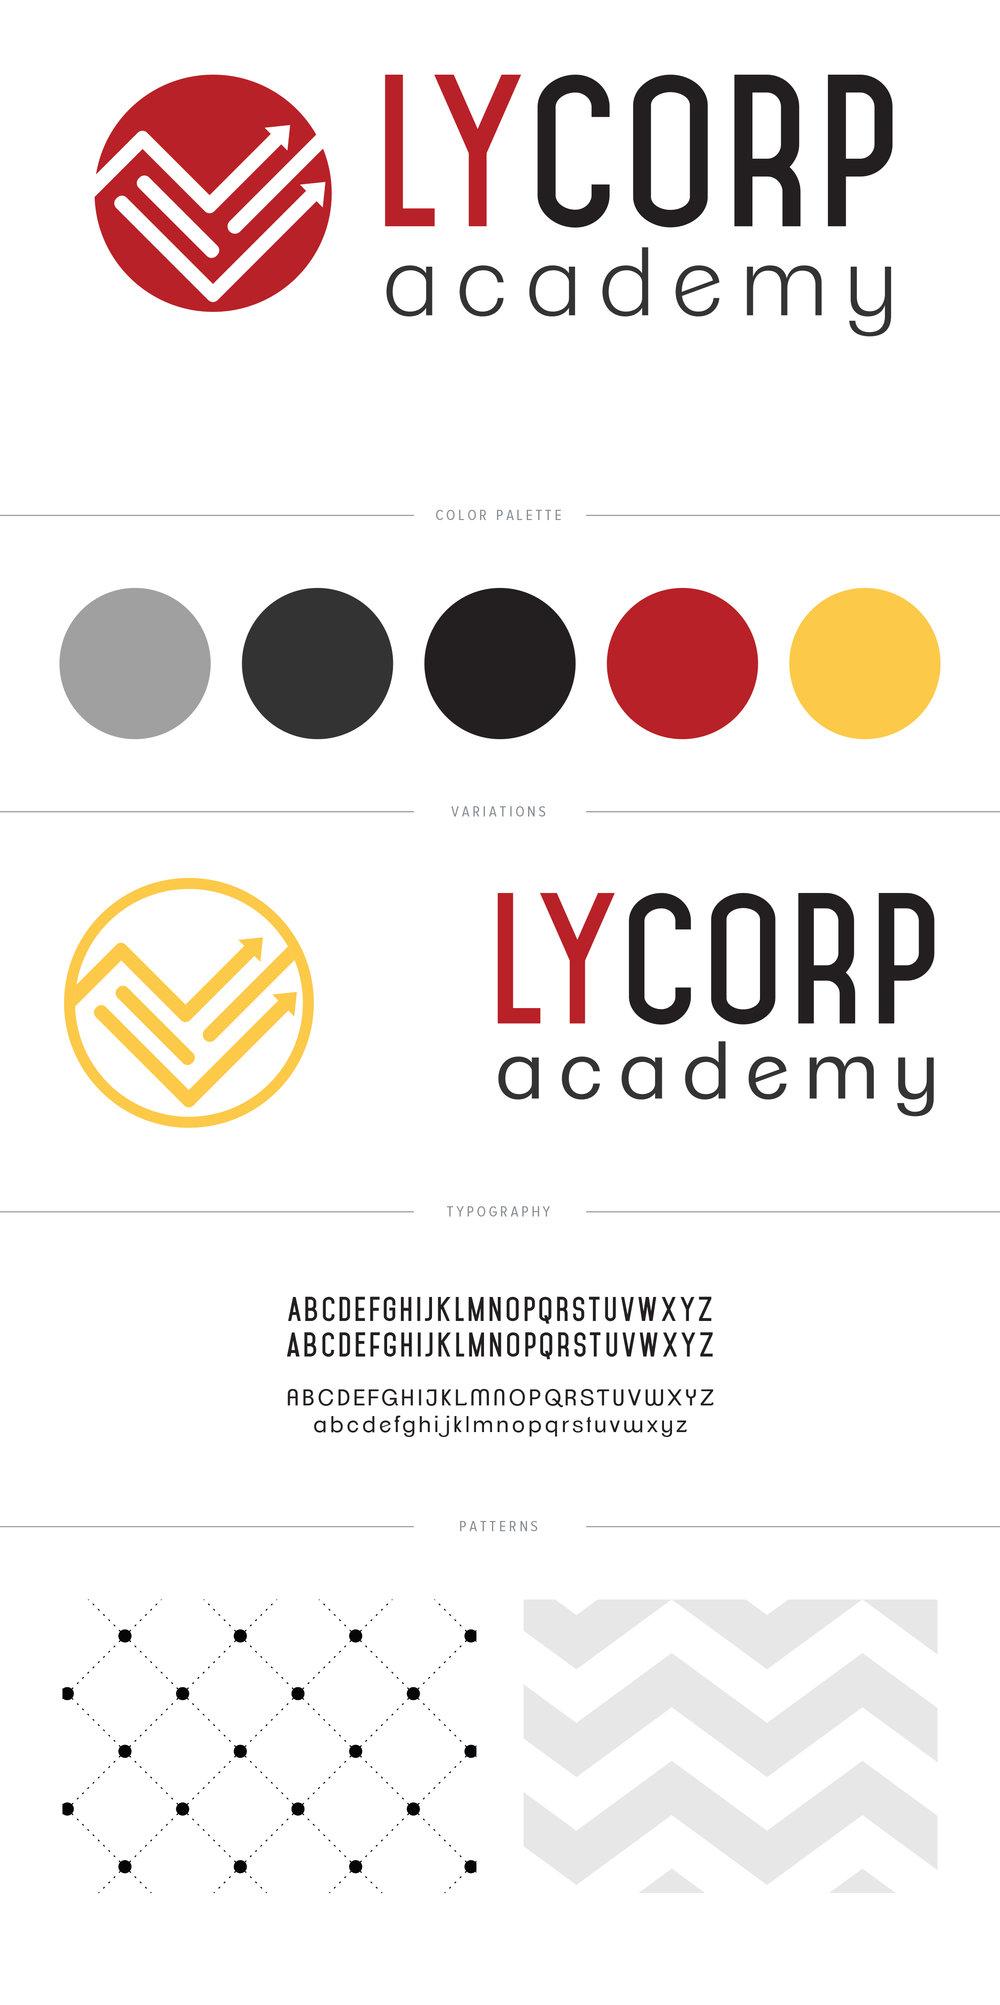 Lycorp-BrandBoard.jpg